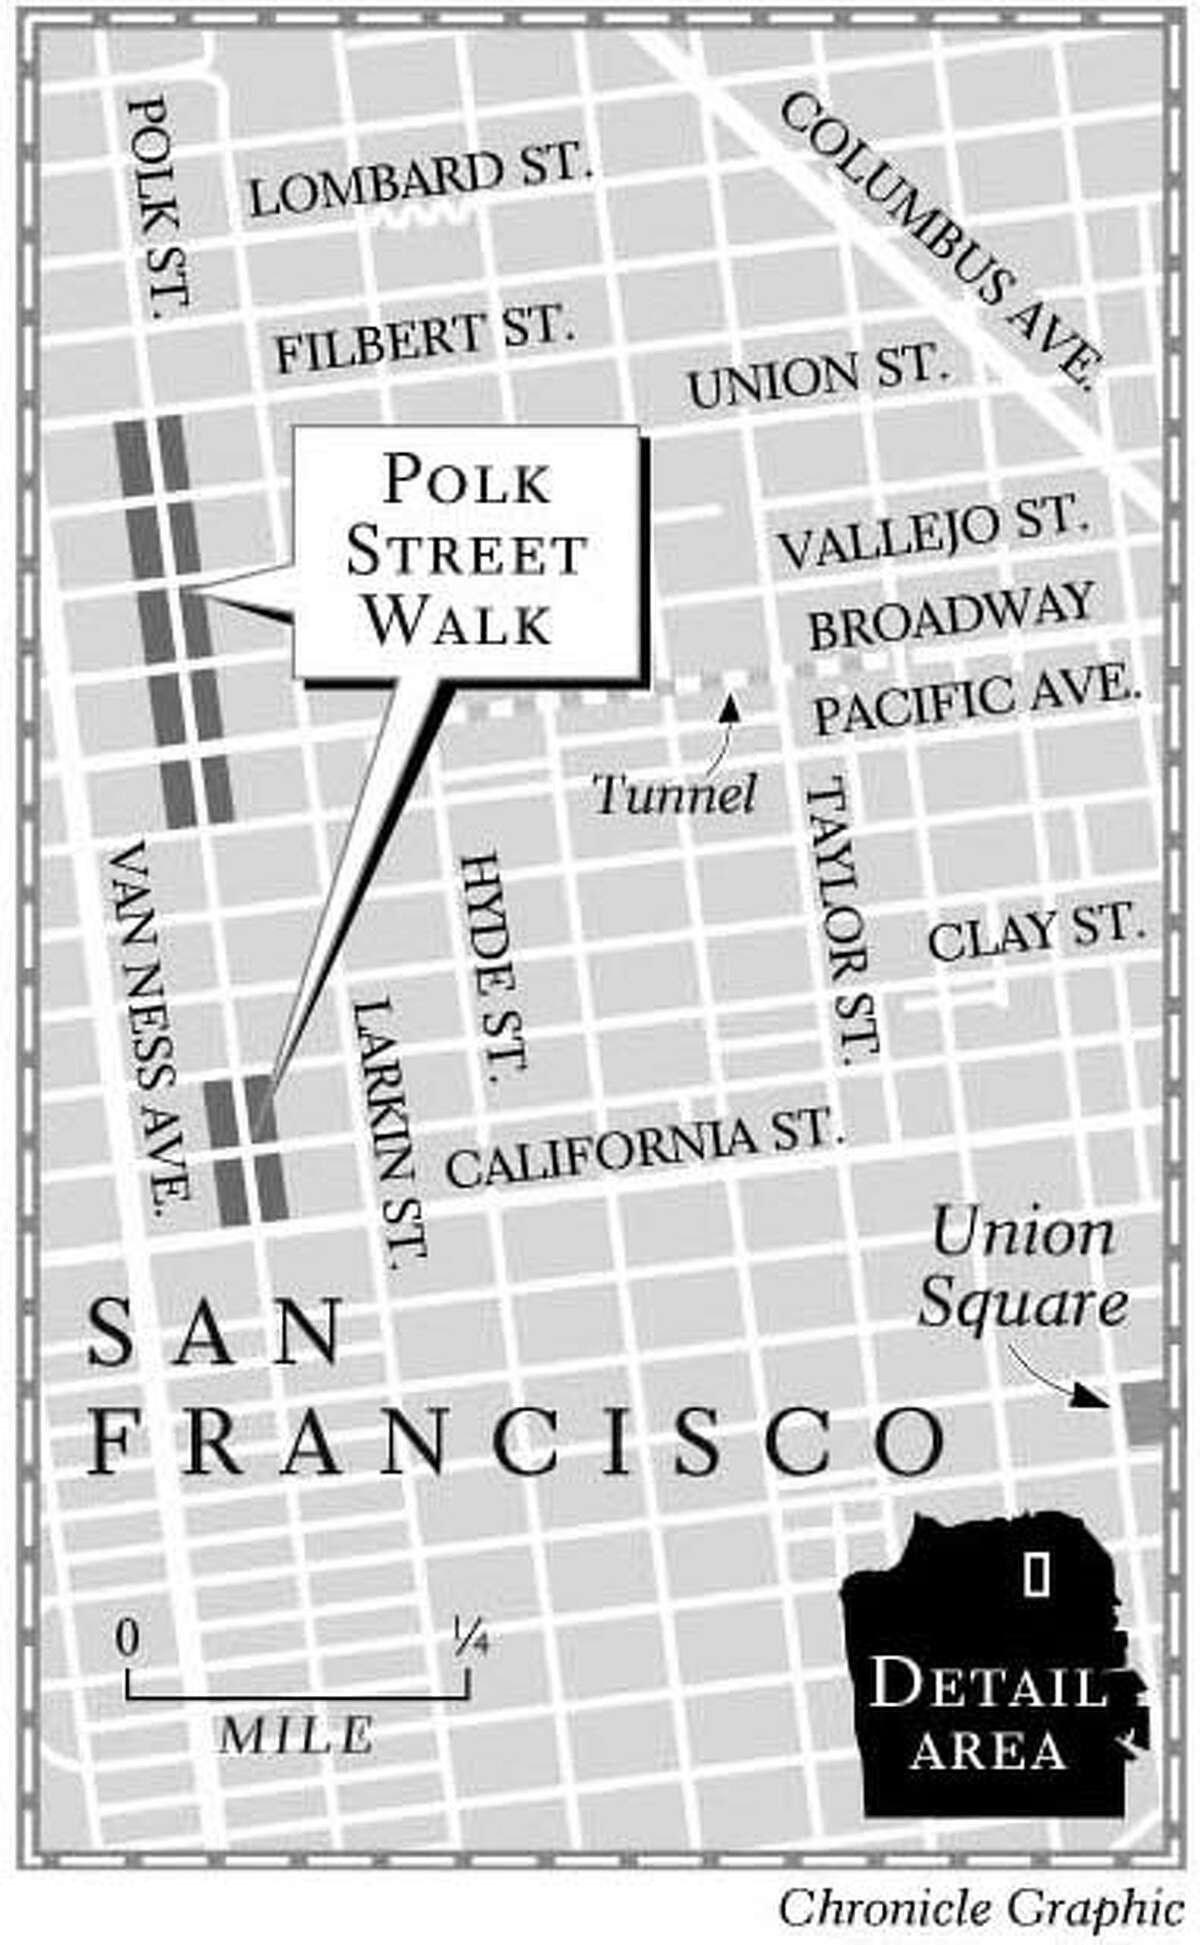 Detail of Polk Gulch walking area.